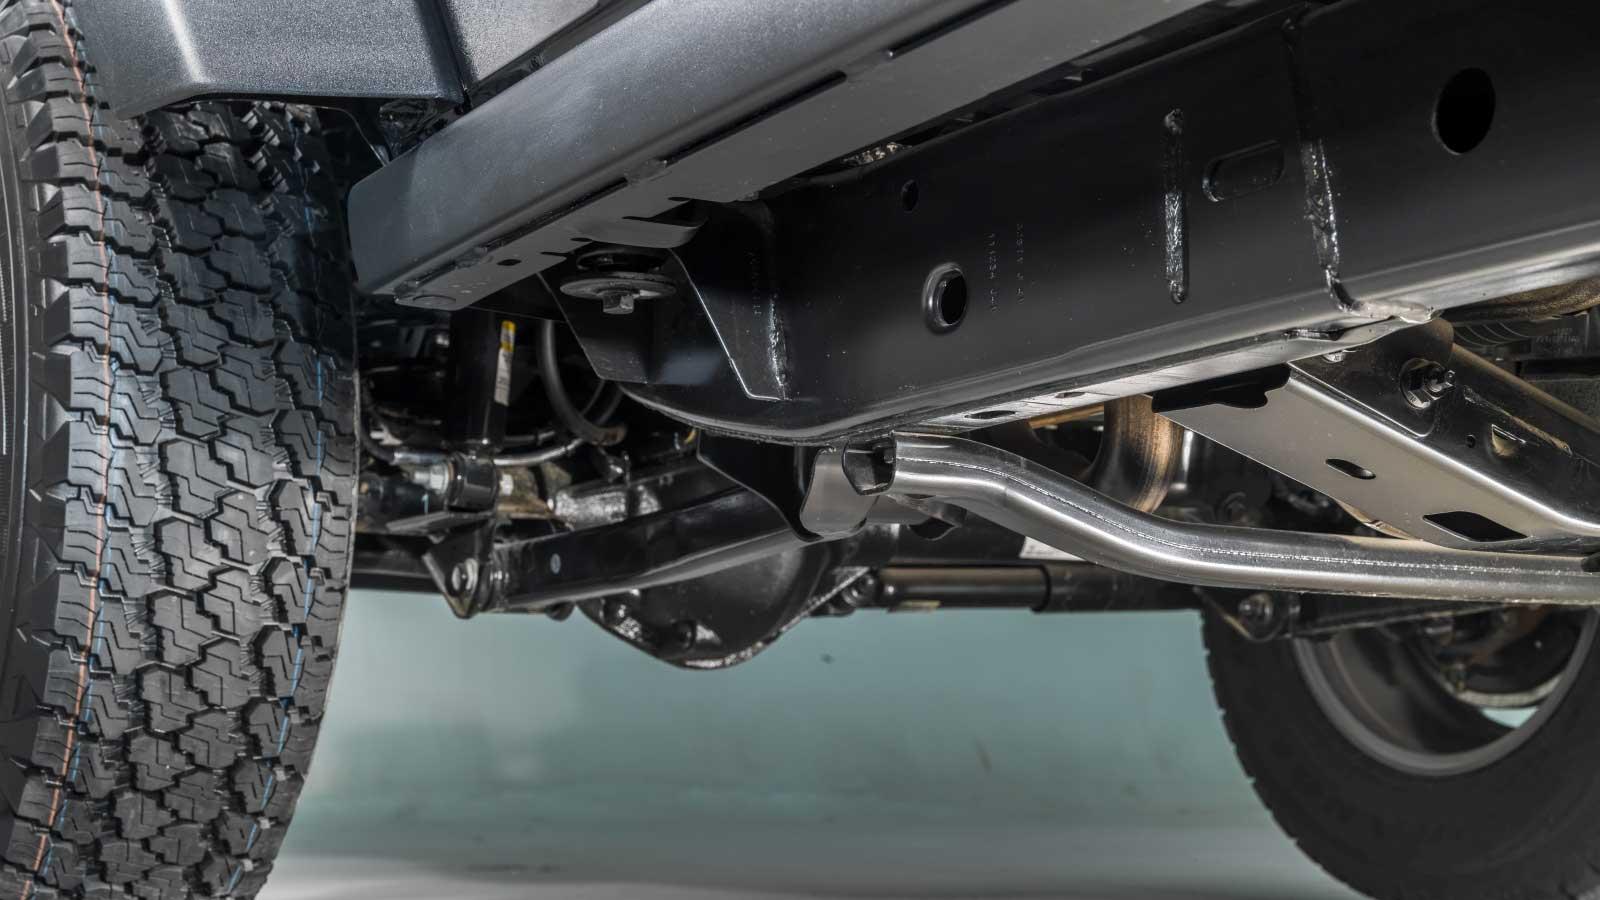 Truck Frame Repair Robs Customs And Restorations